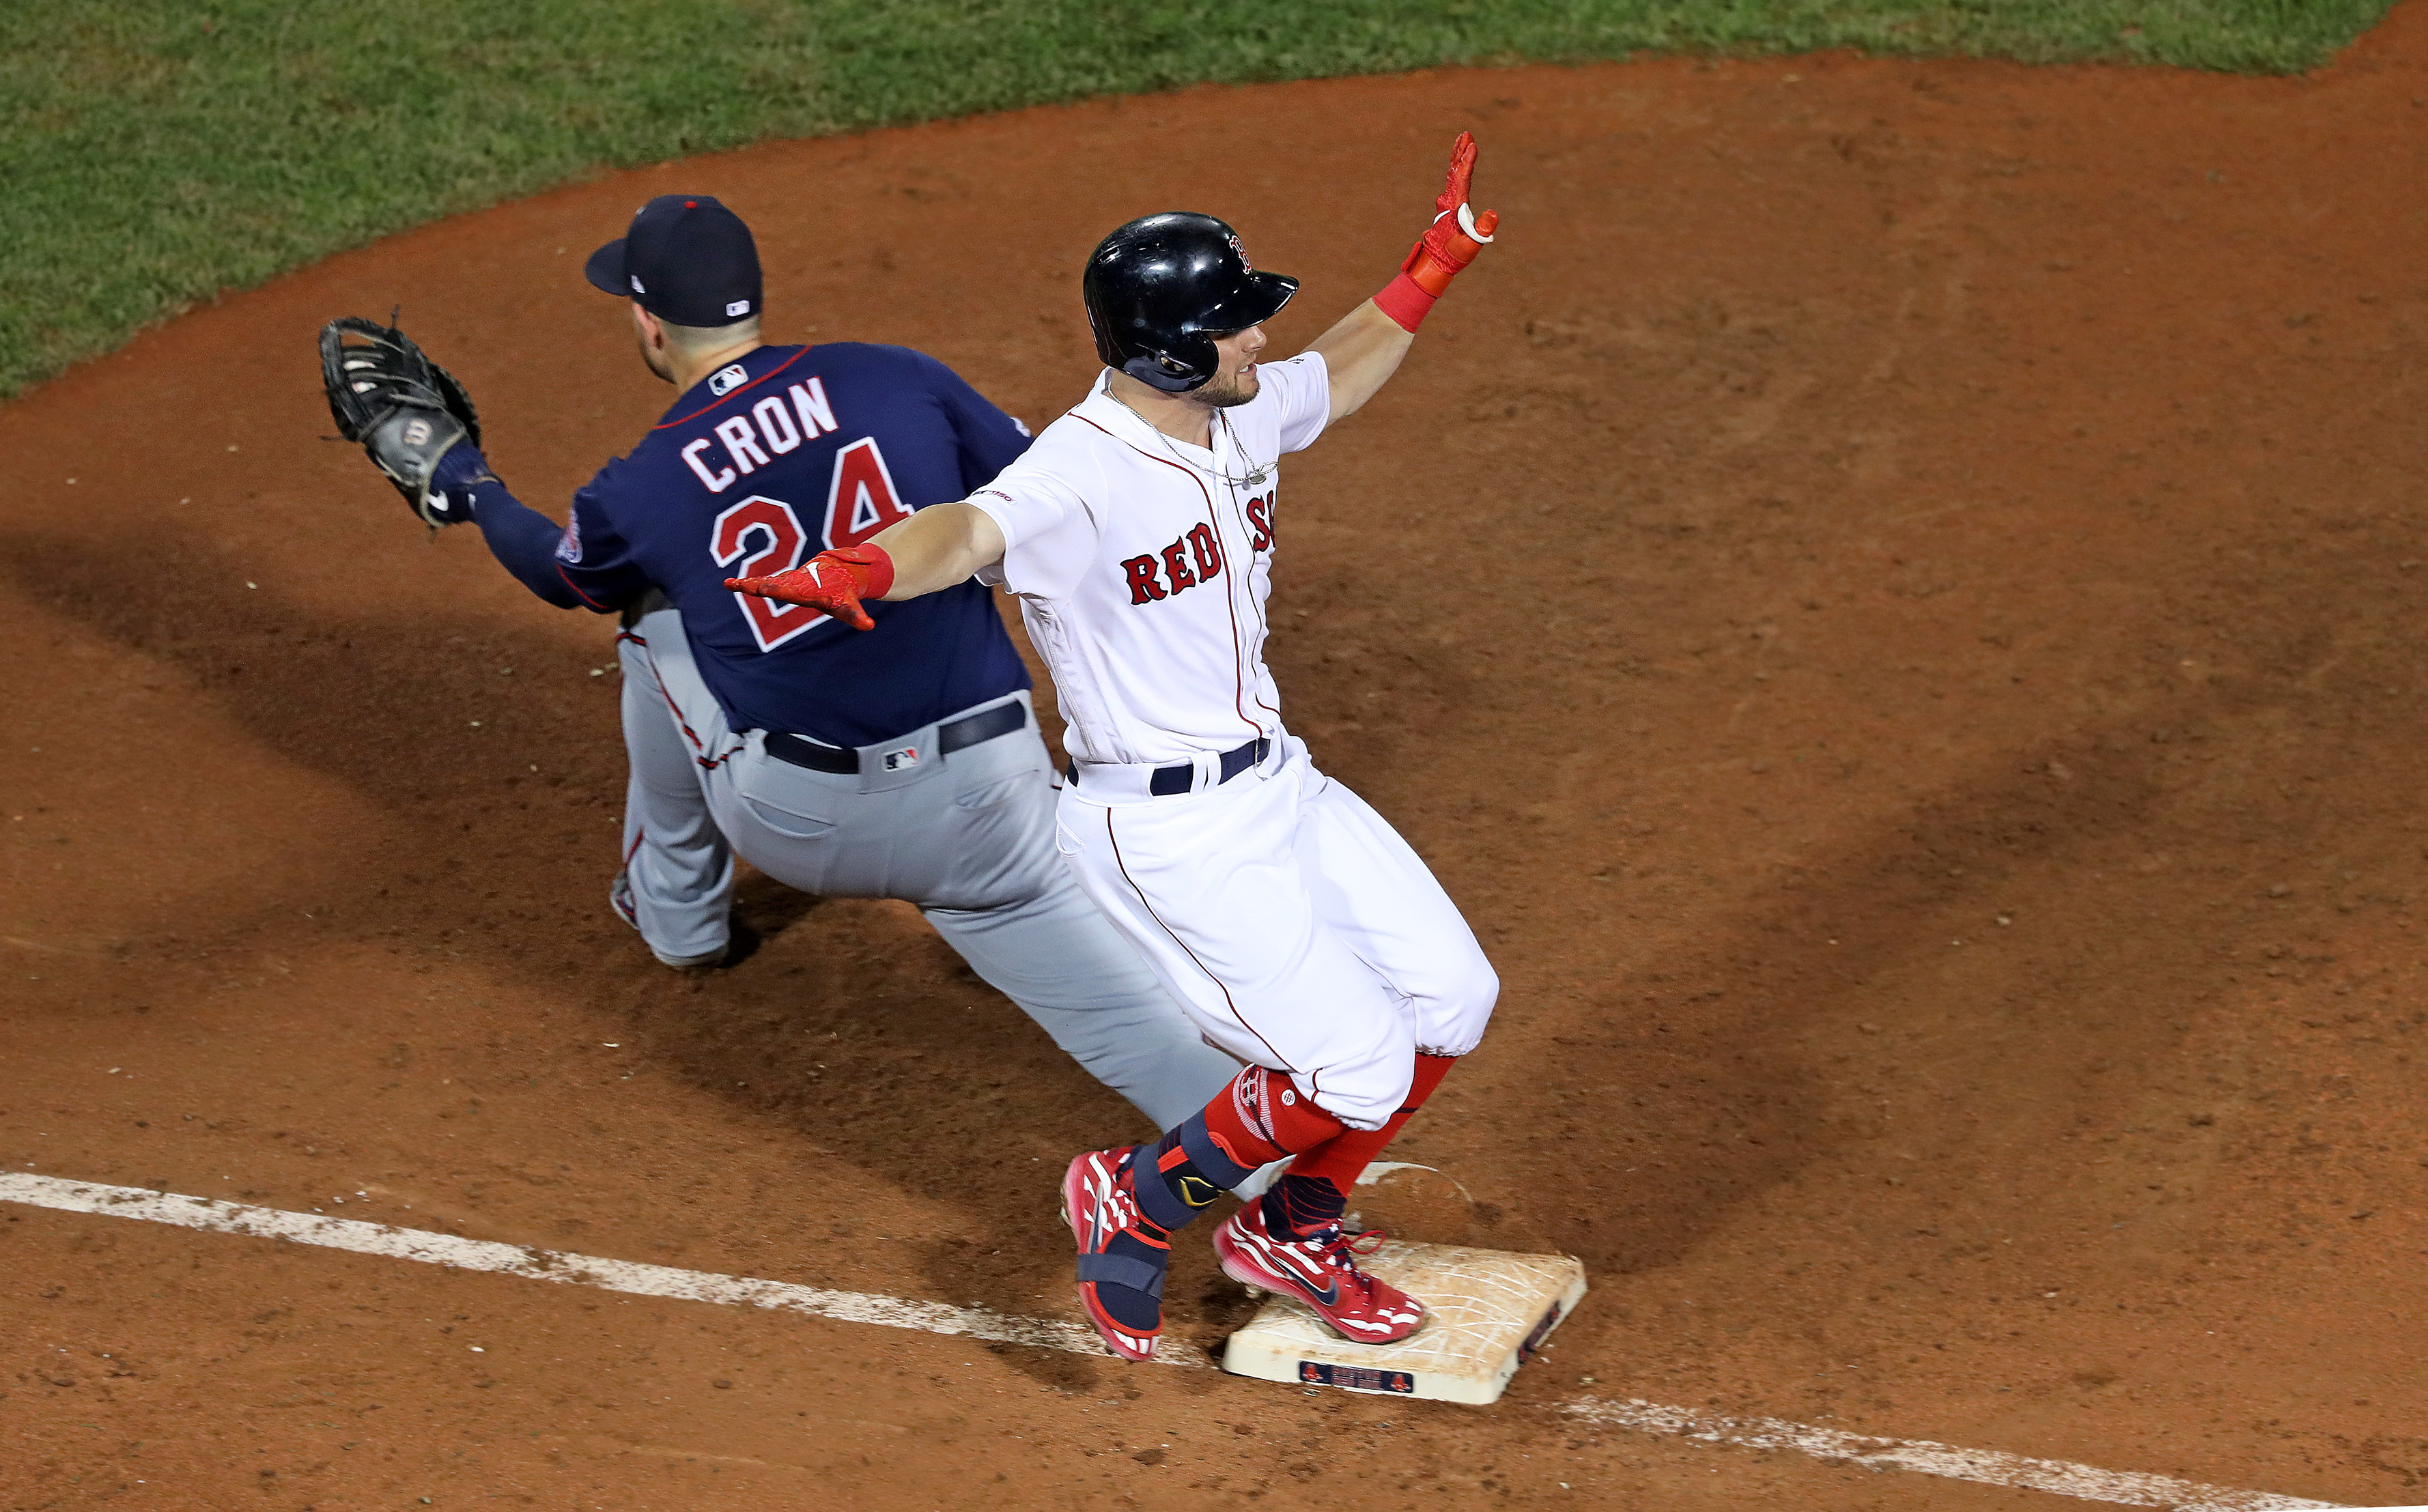 Minnesota Twins Vs. Boston Red Sox At Fenway Park